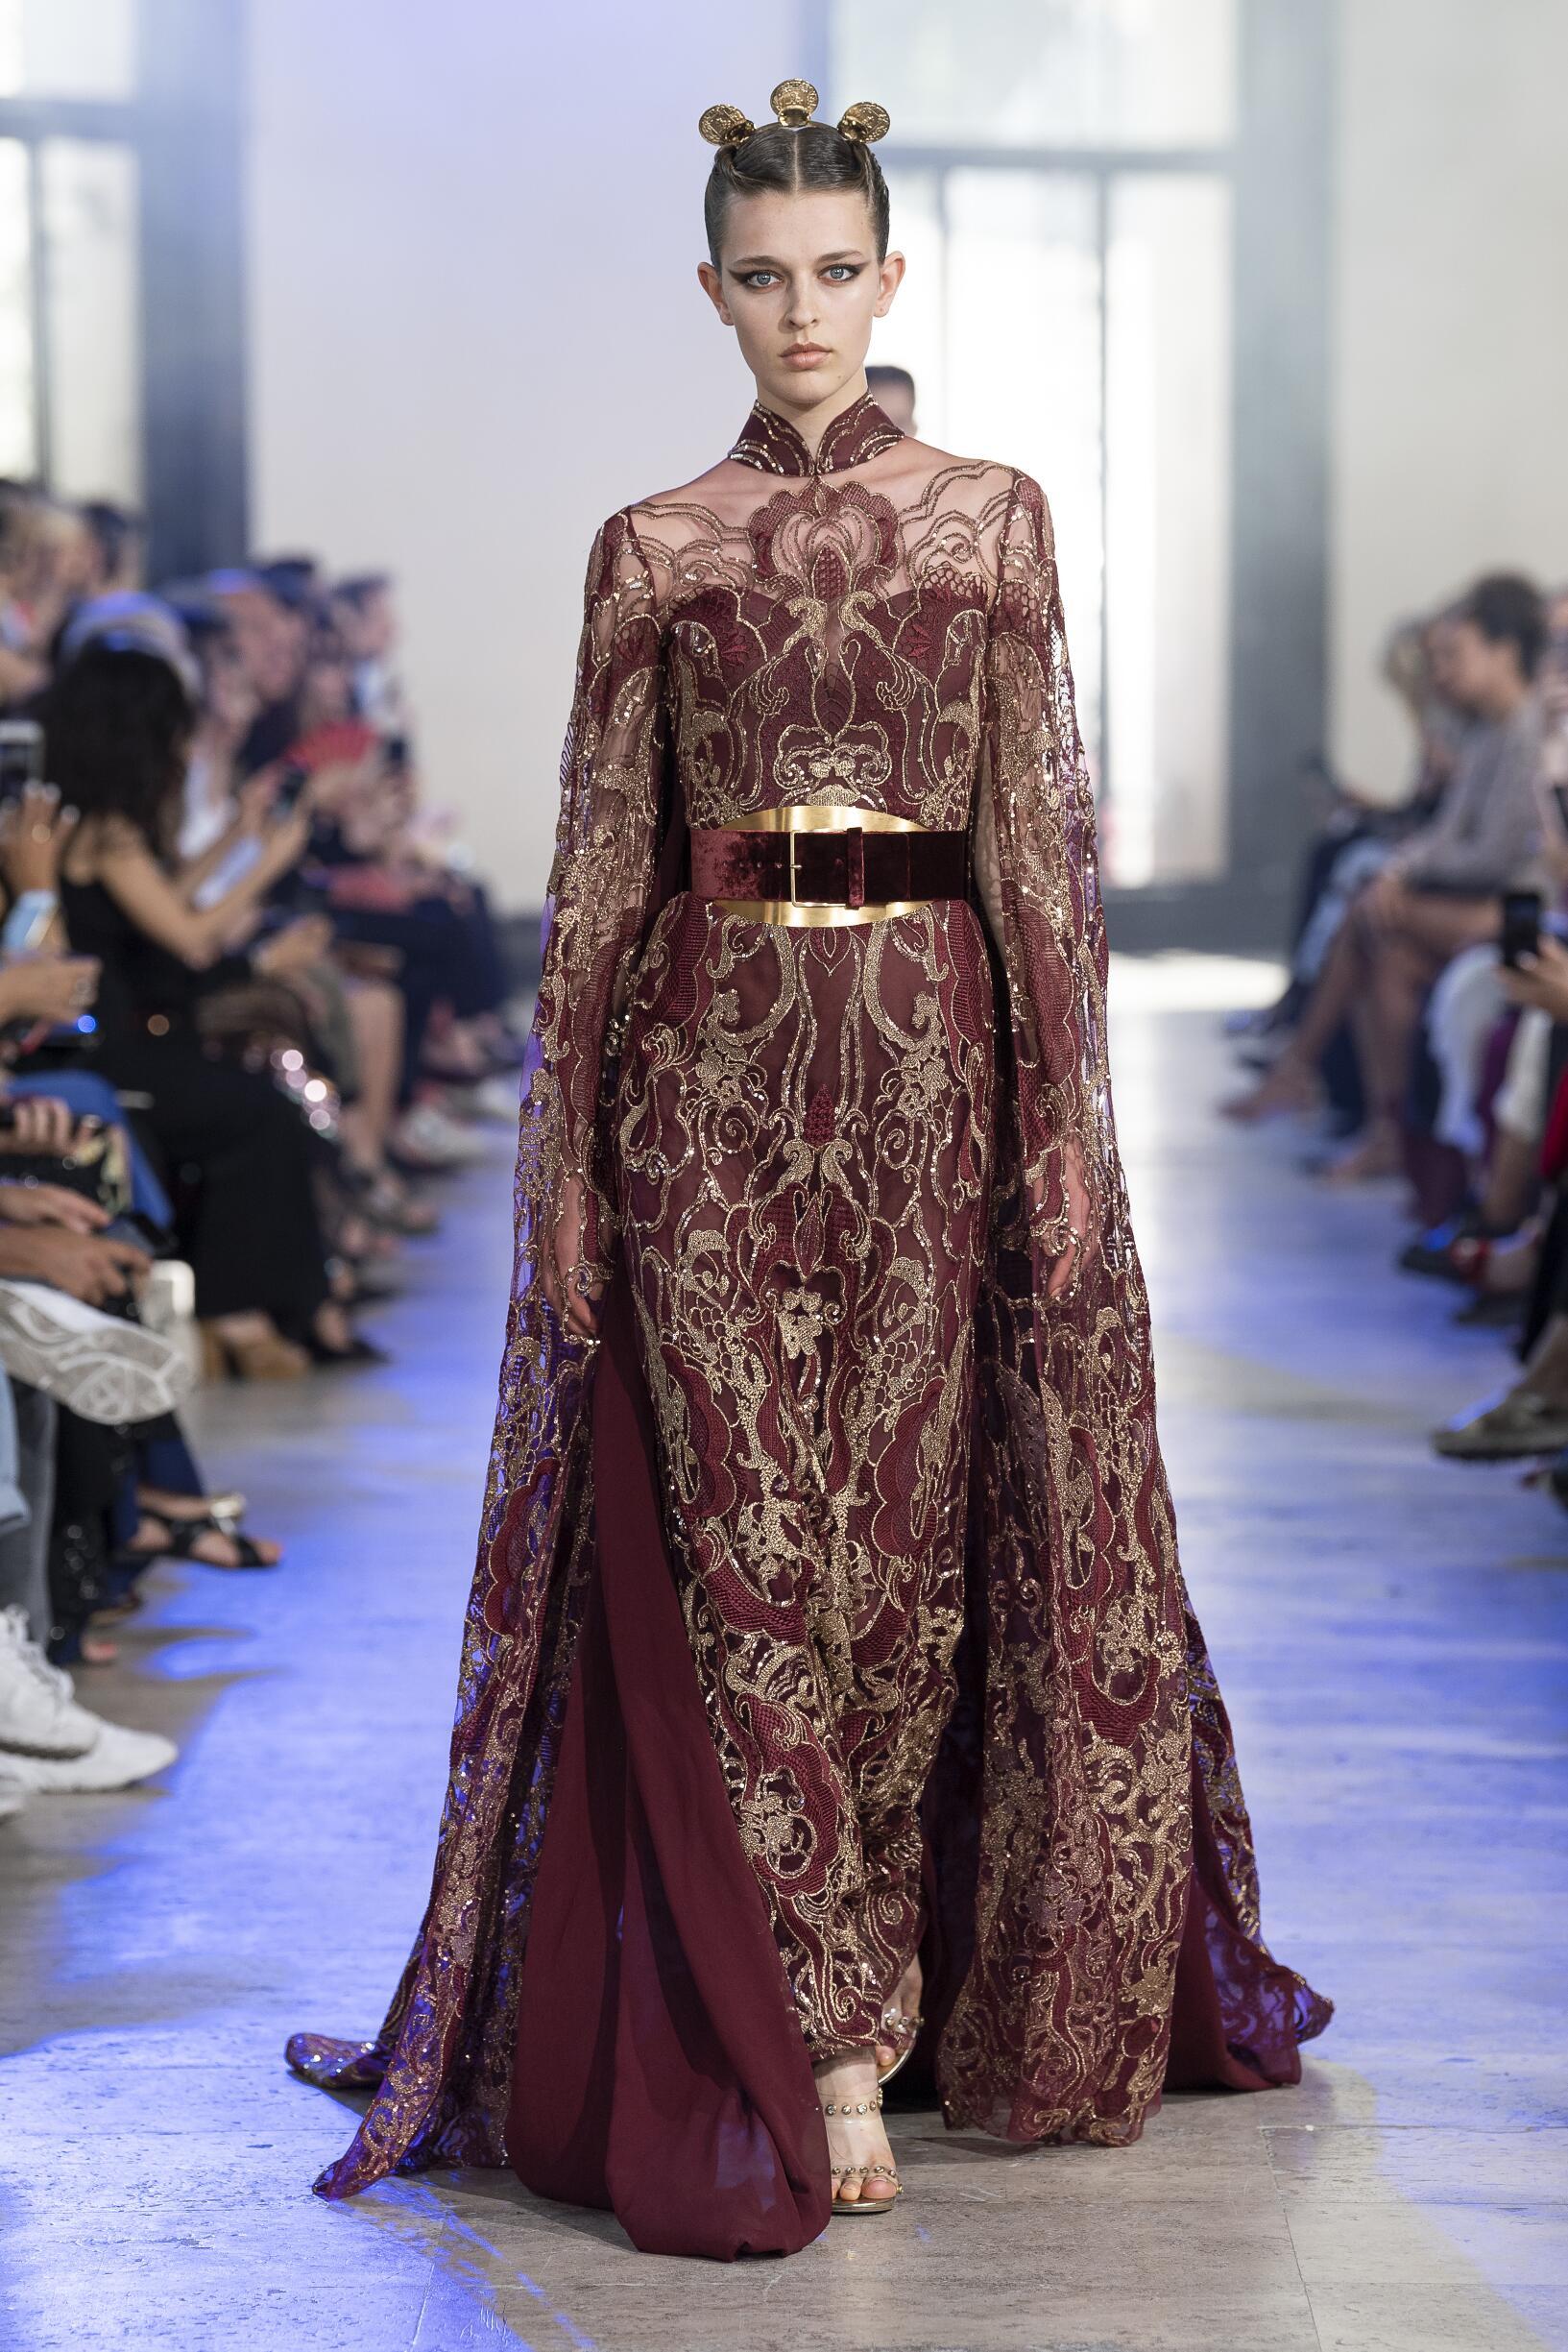 Elie Saab Haute Couture Winter 2019-2020 Catwalk